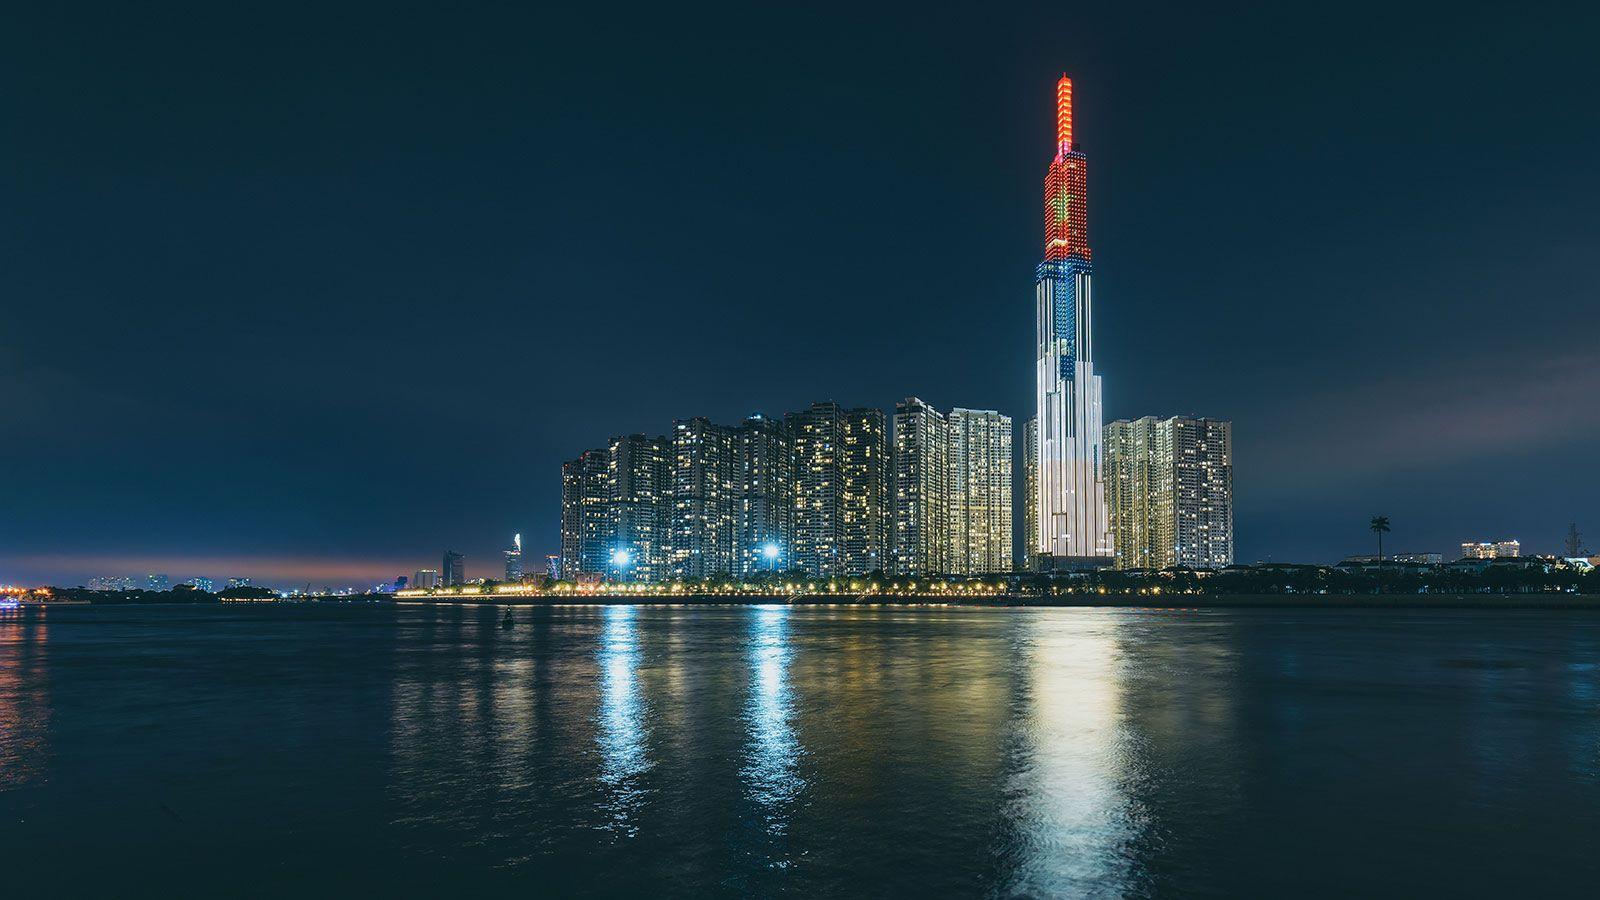 Landmark 81 Skyscraper in Vietnam - Mace Group